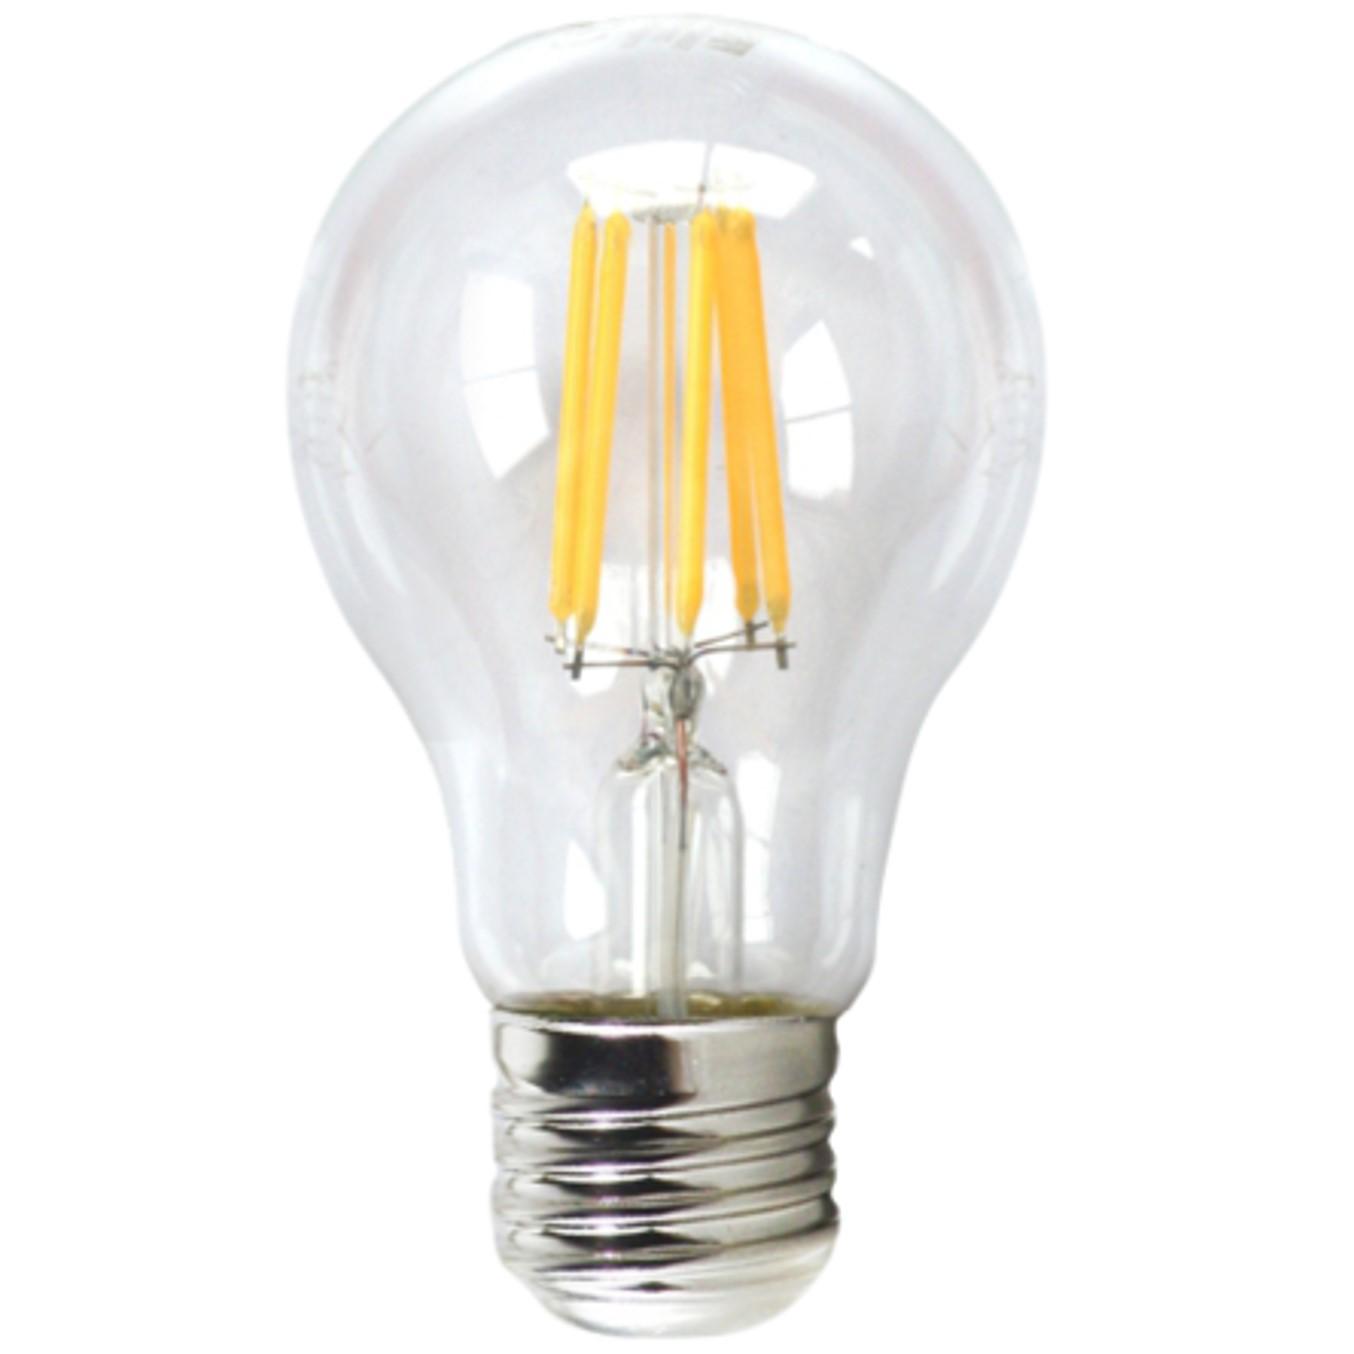 Bombilla led silver electronic filamento transprente estandar 6w=80w -  e27 -  3000k luz calida -  a++